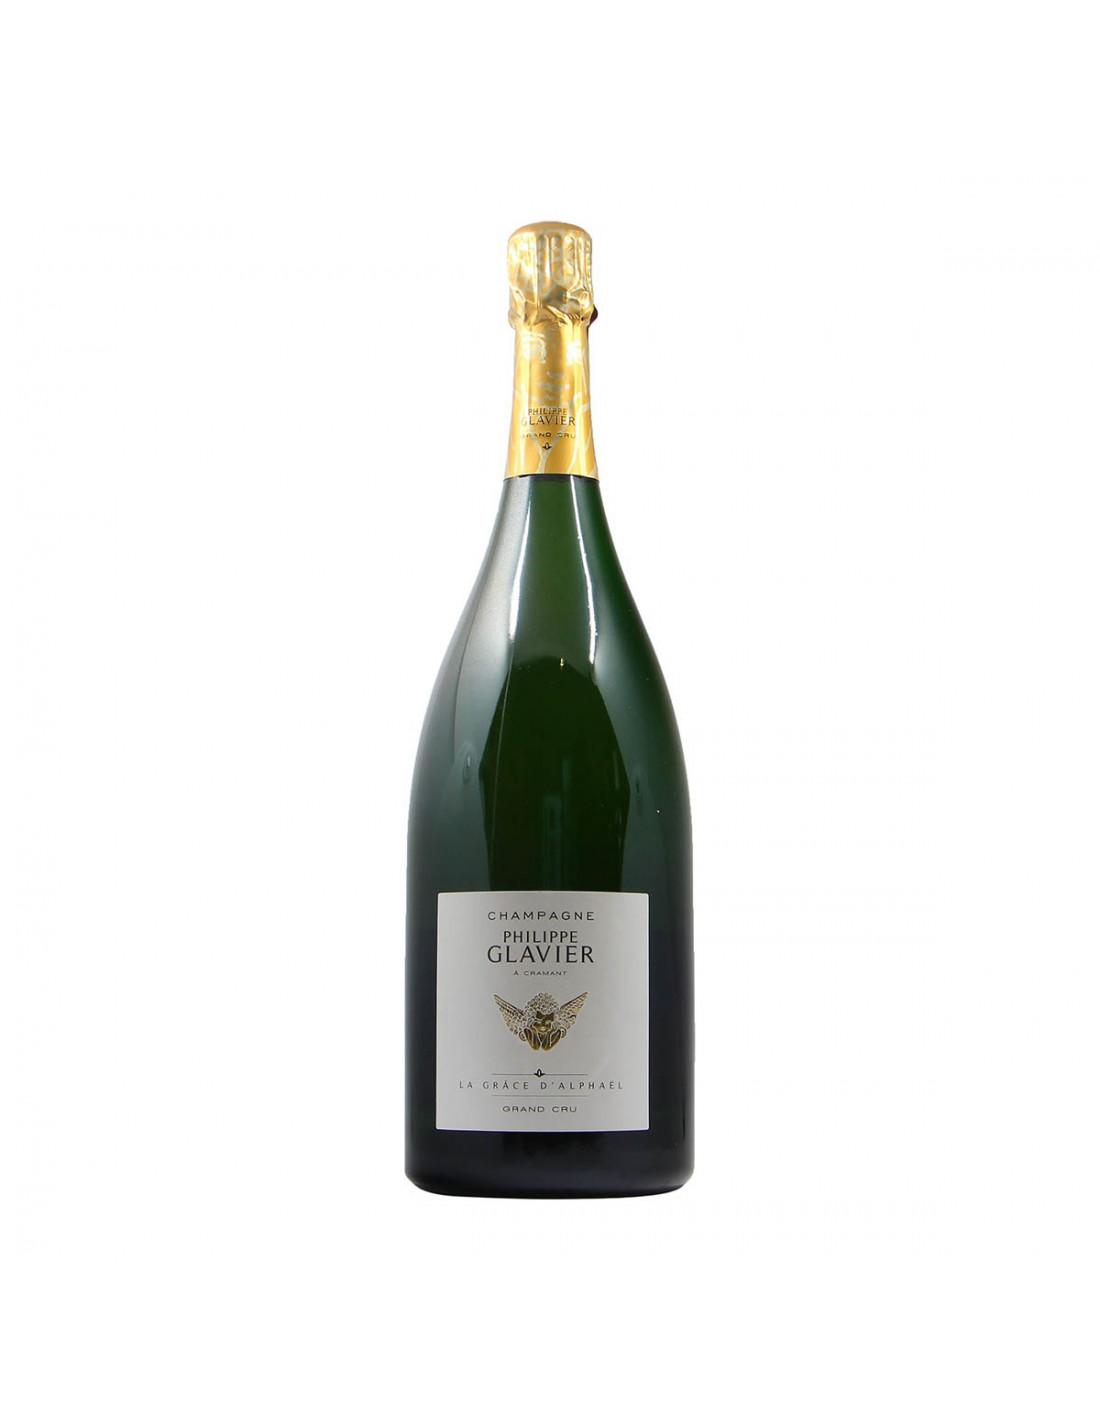 Philippe Glavier Champagne La Grace d Alphael Magnum Grand Cru Grandi Bottiglie